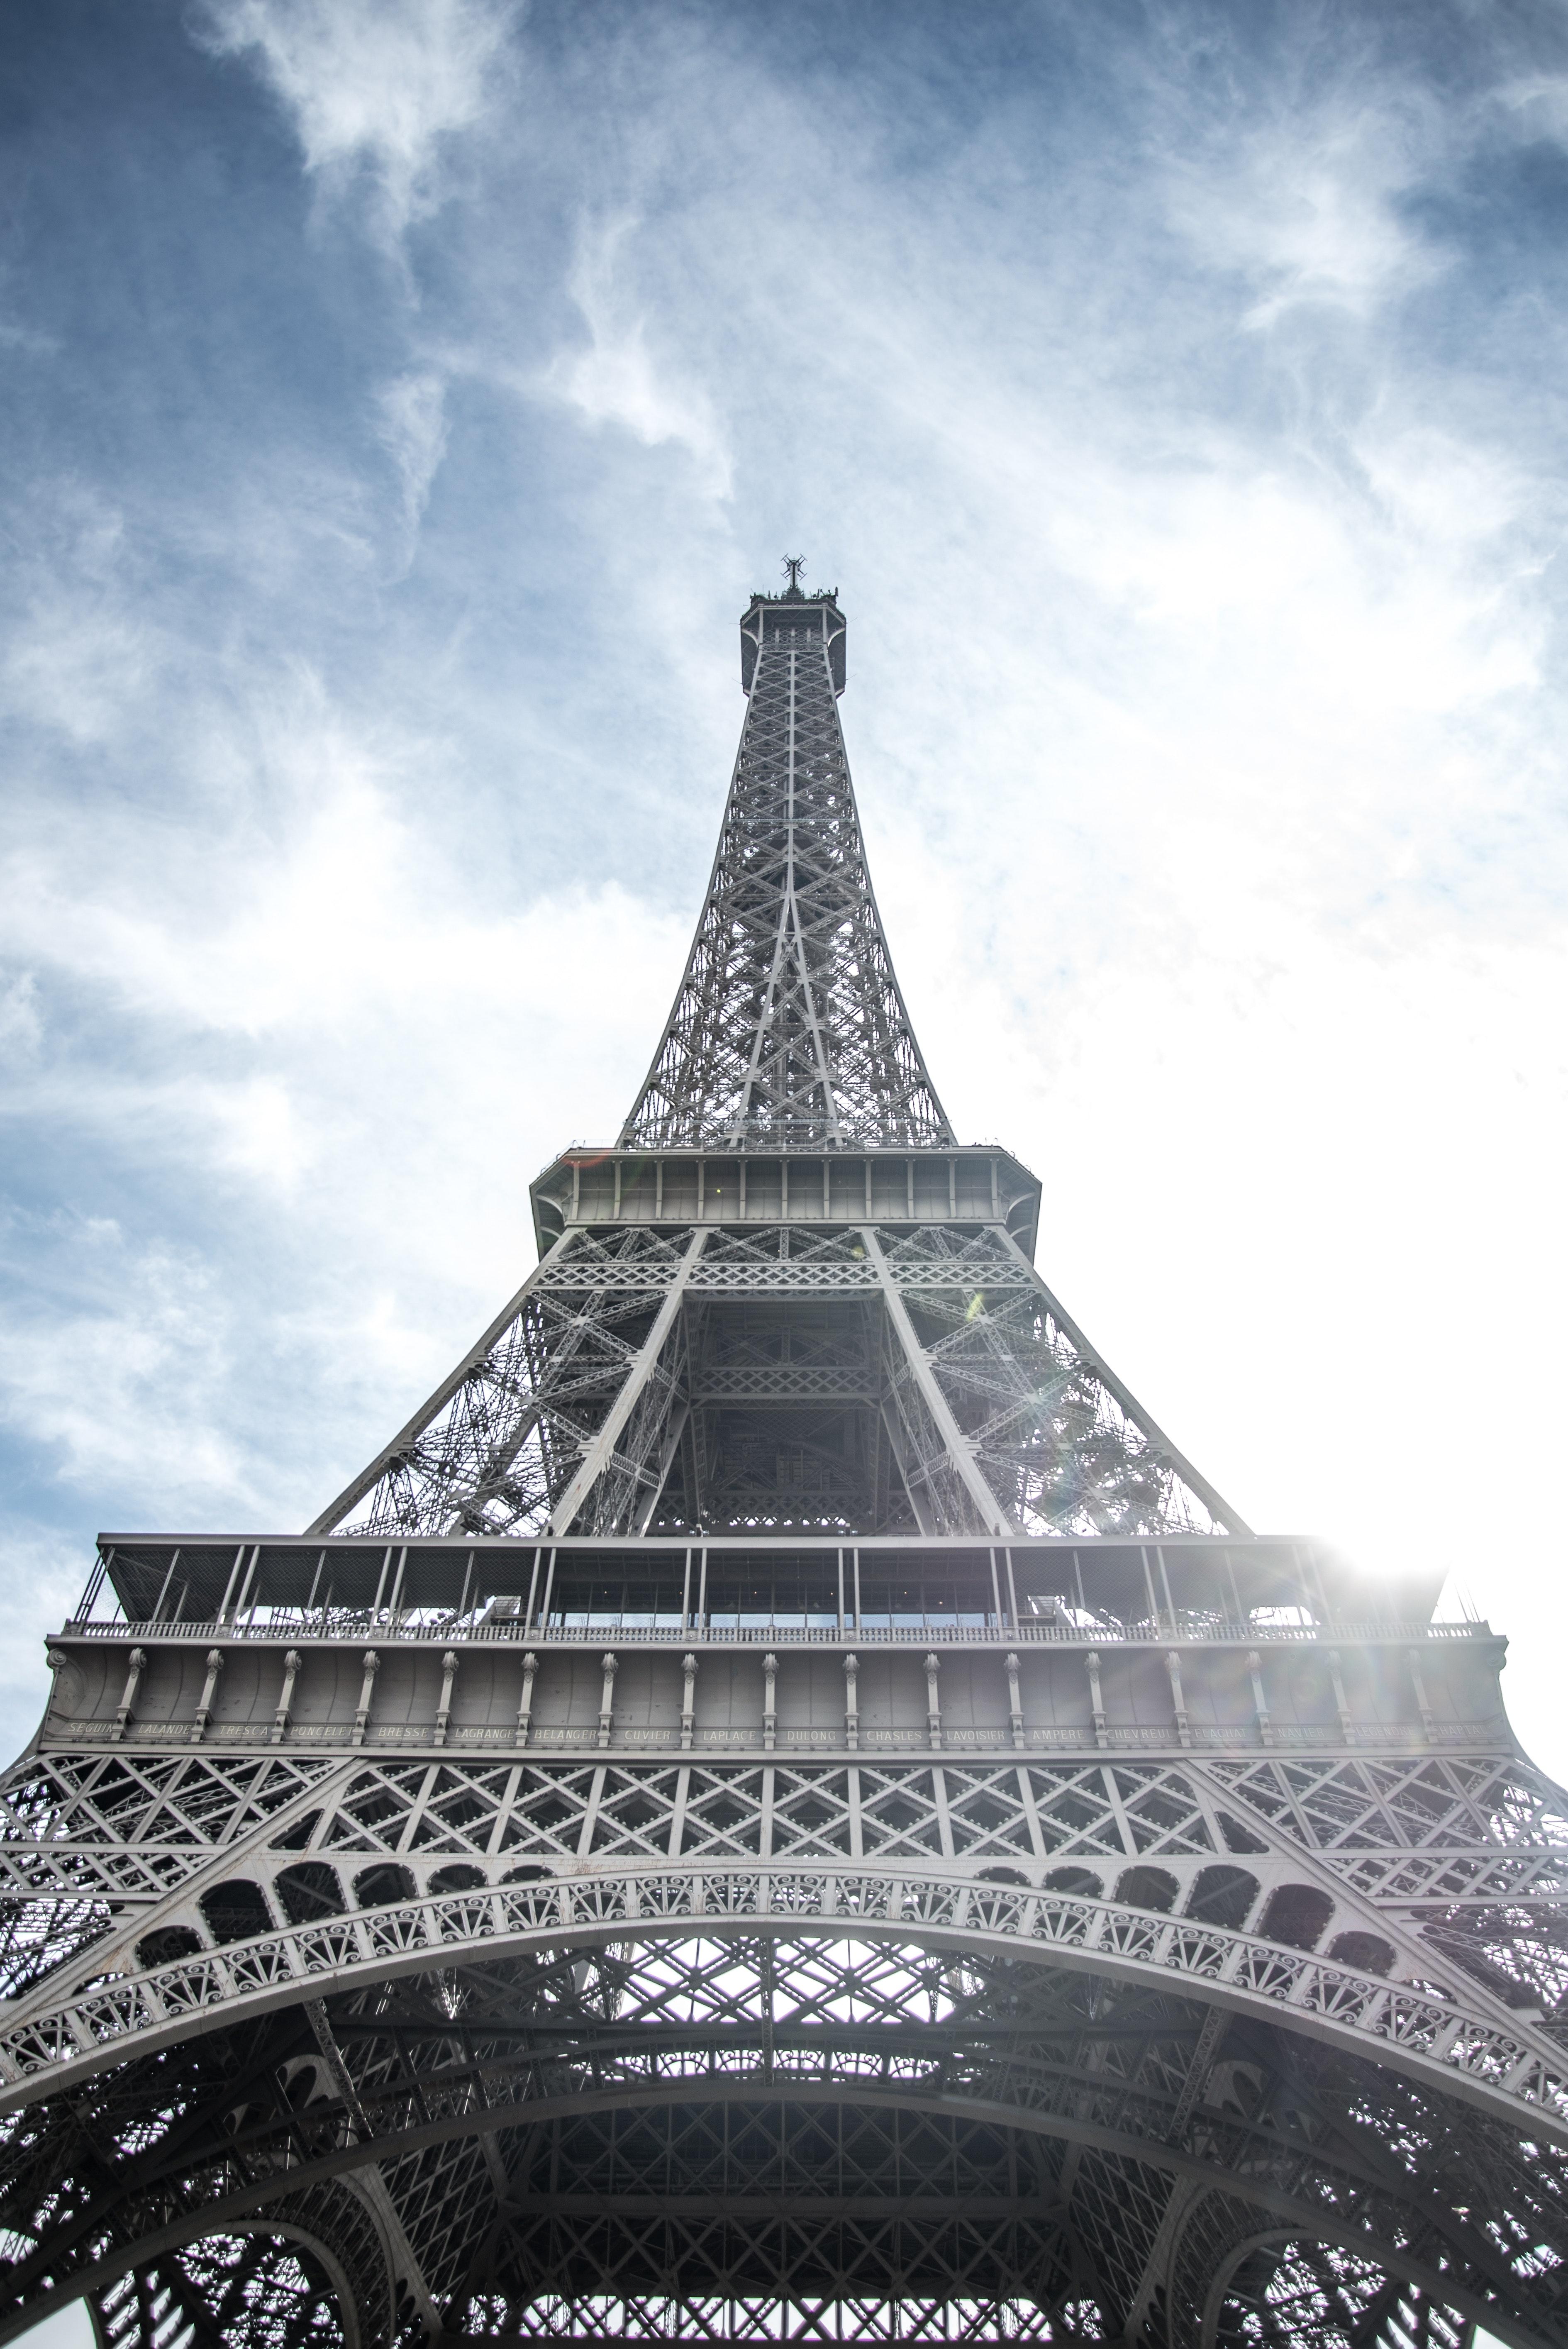 Eiffel Tower Illustration 183 Free Stock Photo